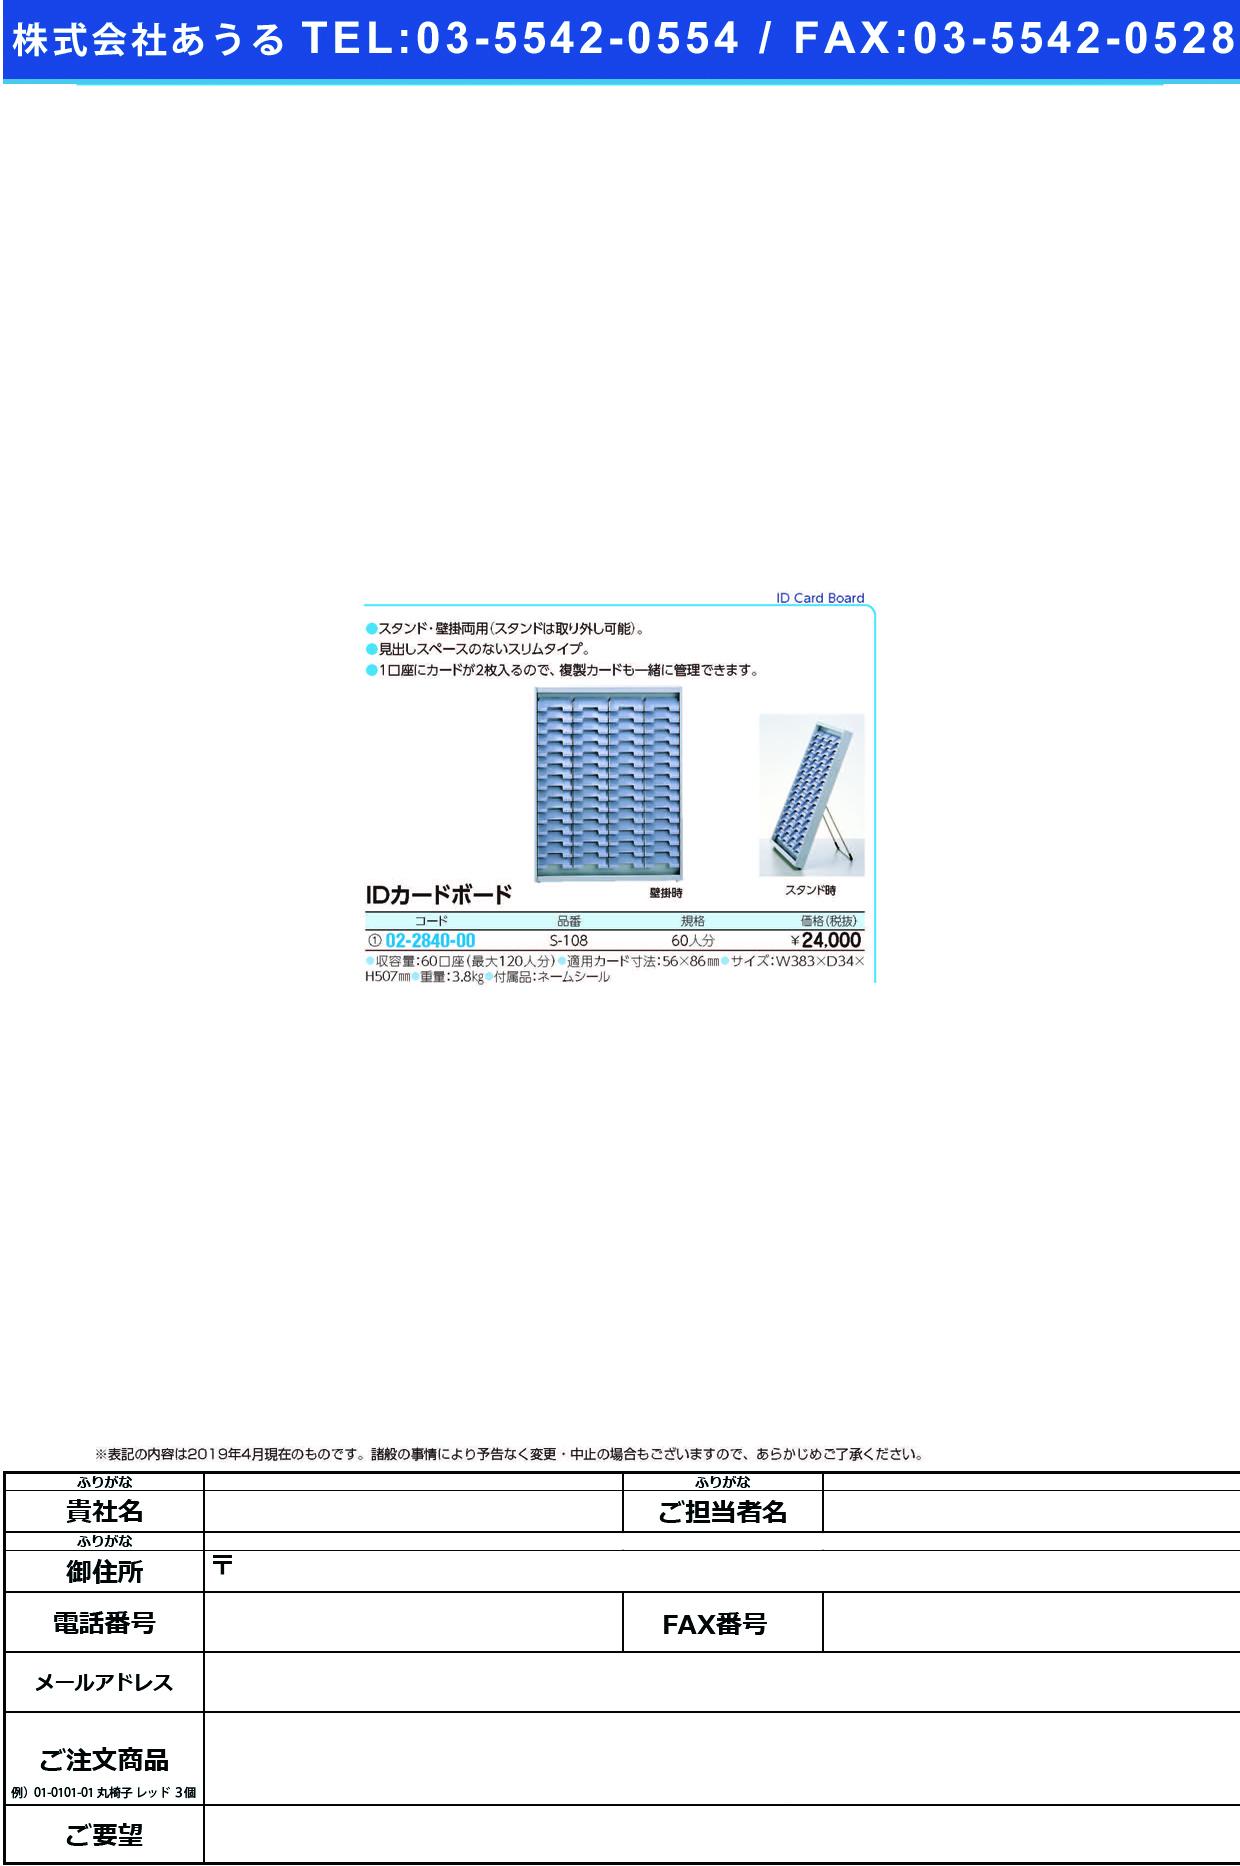 (02-2840-00)IDカードボード(60口座) S-108 IDカードボード(60コウザ)(LIHITLAB.)【1台単位】【2019年カタログ商品】